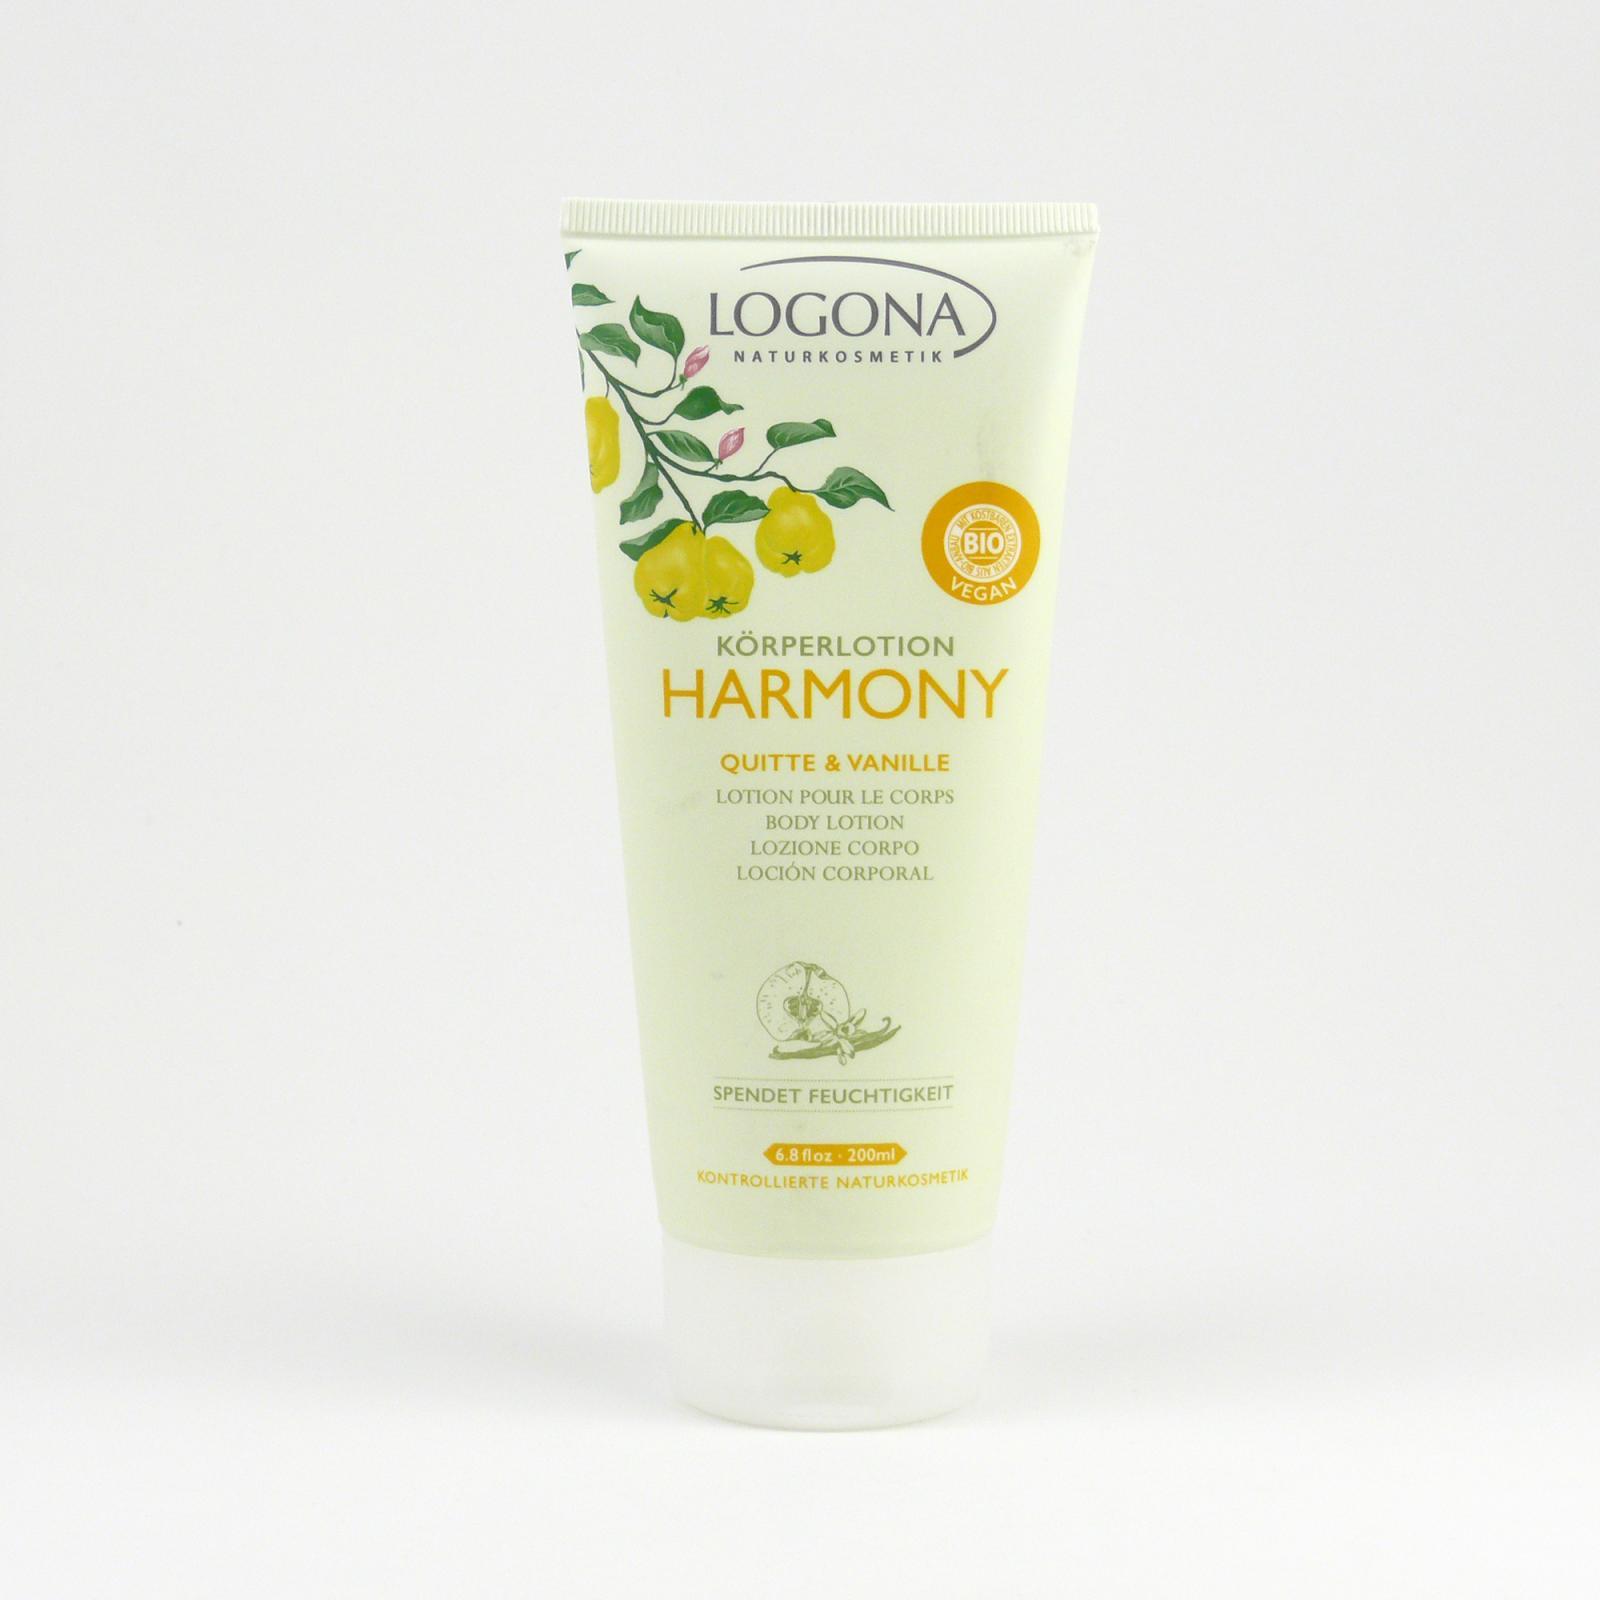 Logona Tělové mléko kdoule a vanilka, Harmony 200 ml